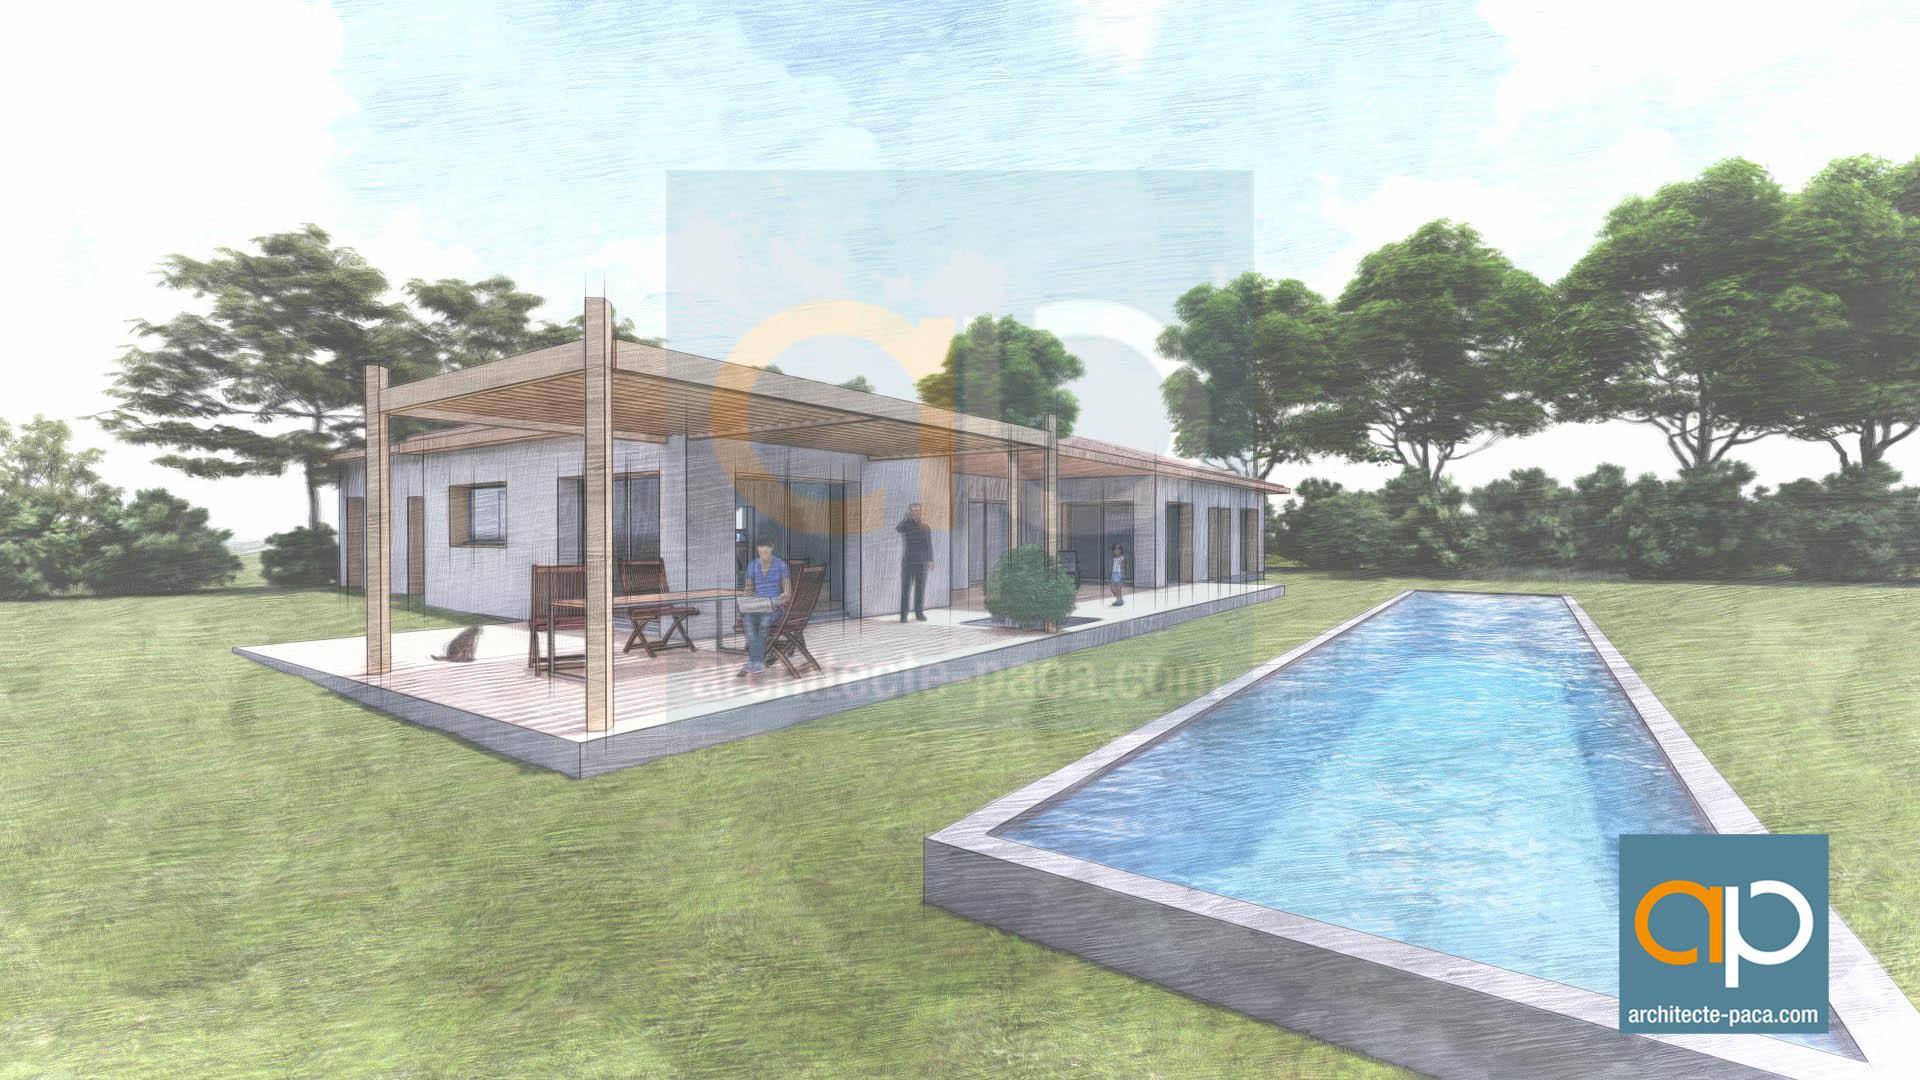 Maison contemporaine architecte paca camliti architecte for Architecte toulouse maison contemporaine